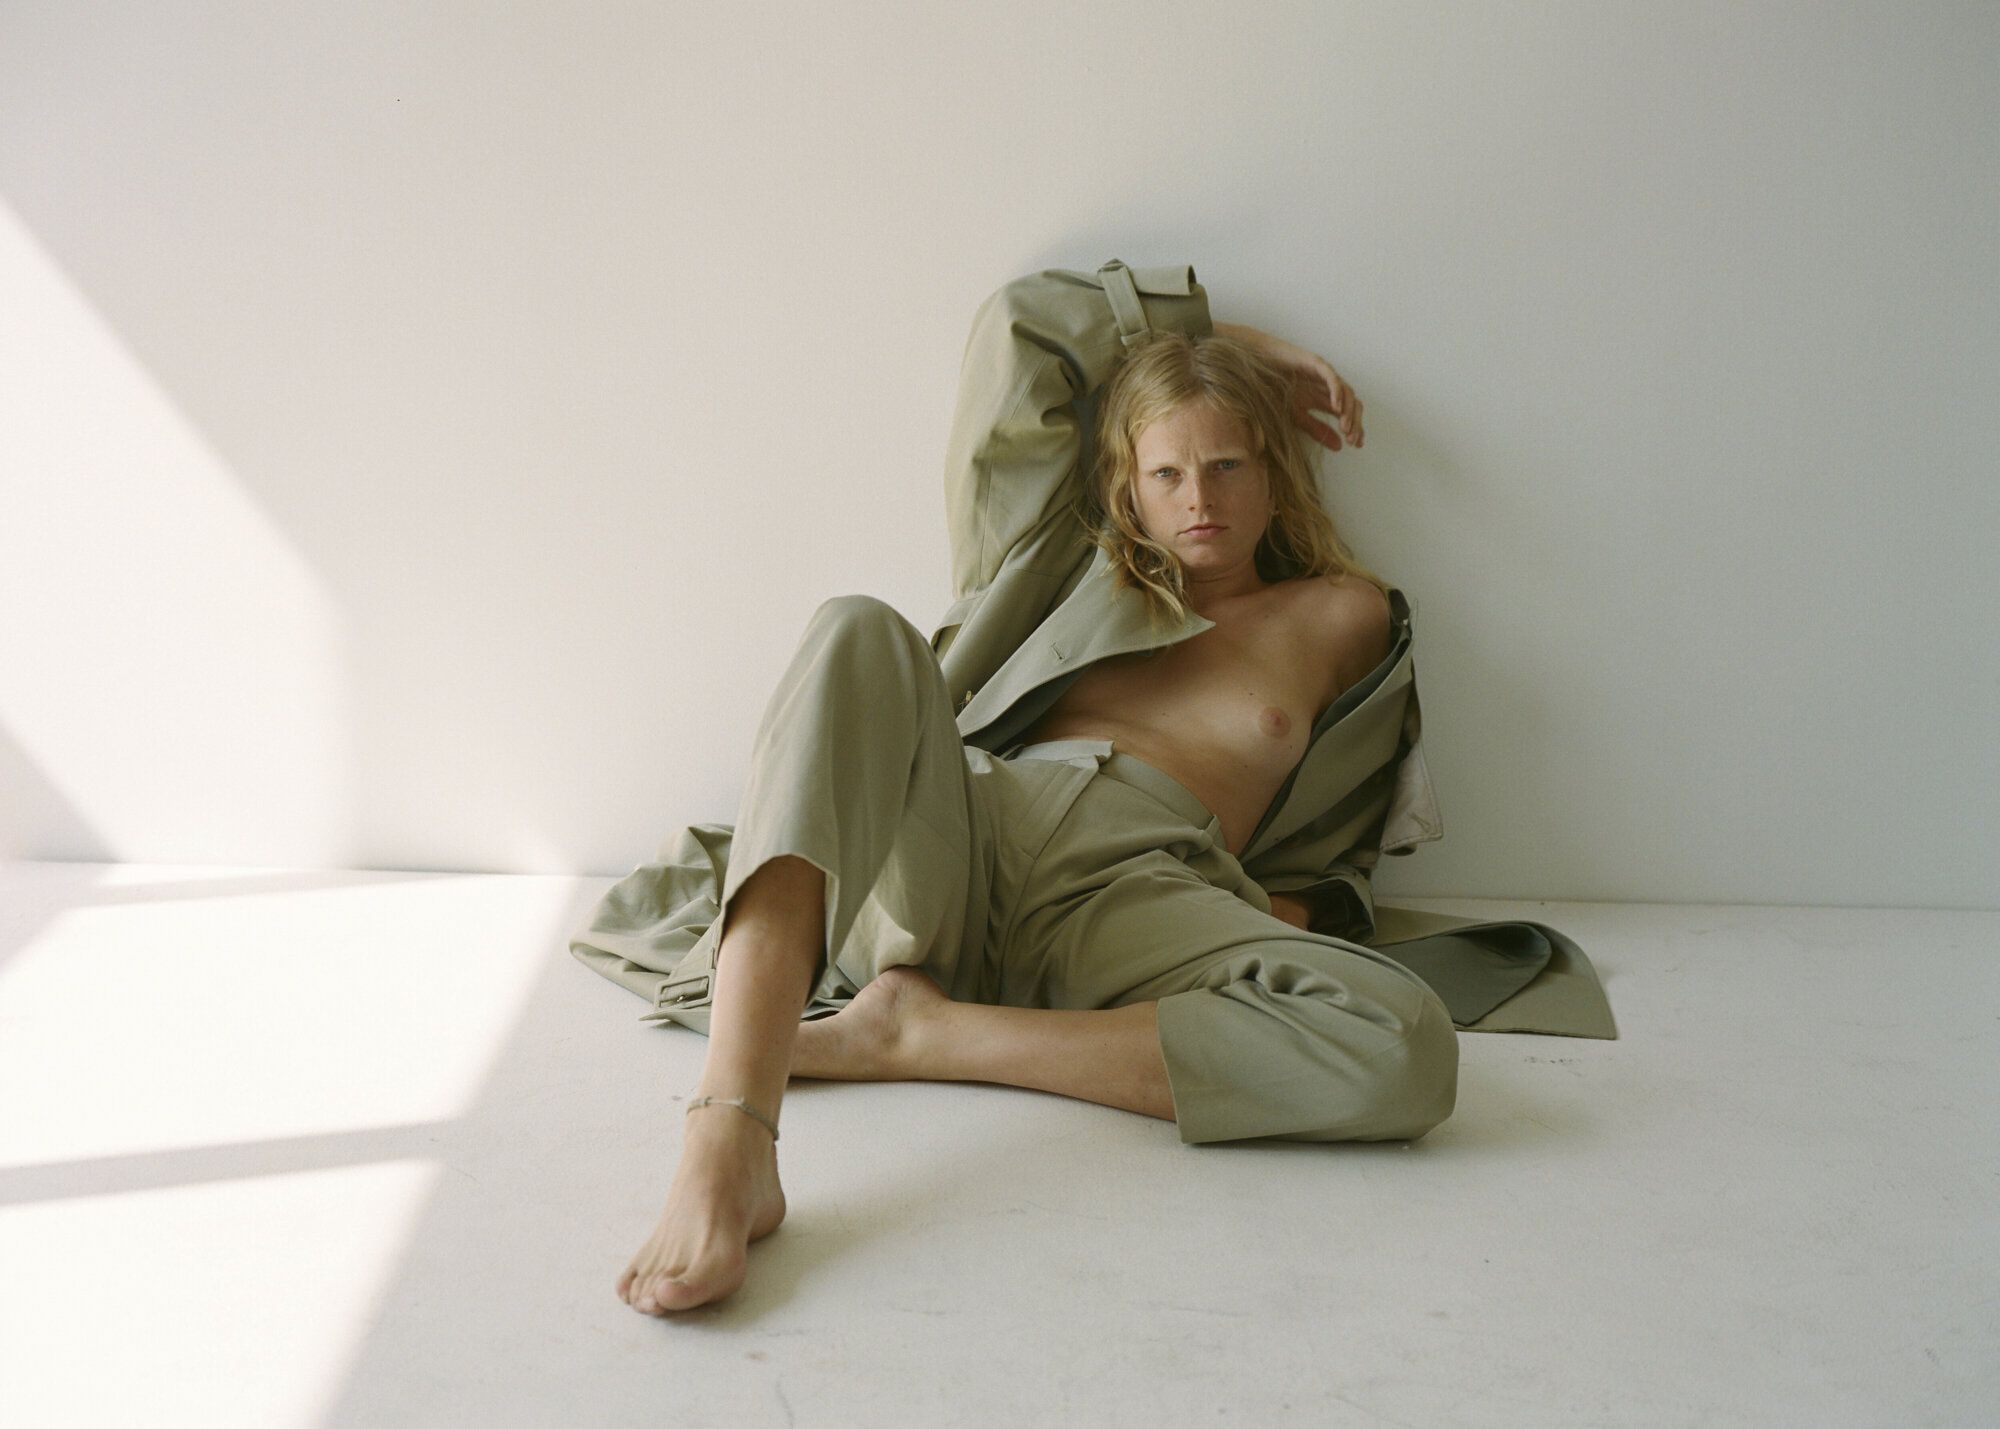 Hanne-Gab-Odiele-by-Mark-Rabadanr-Collection-Issue 6.jpg